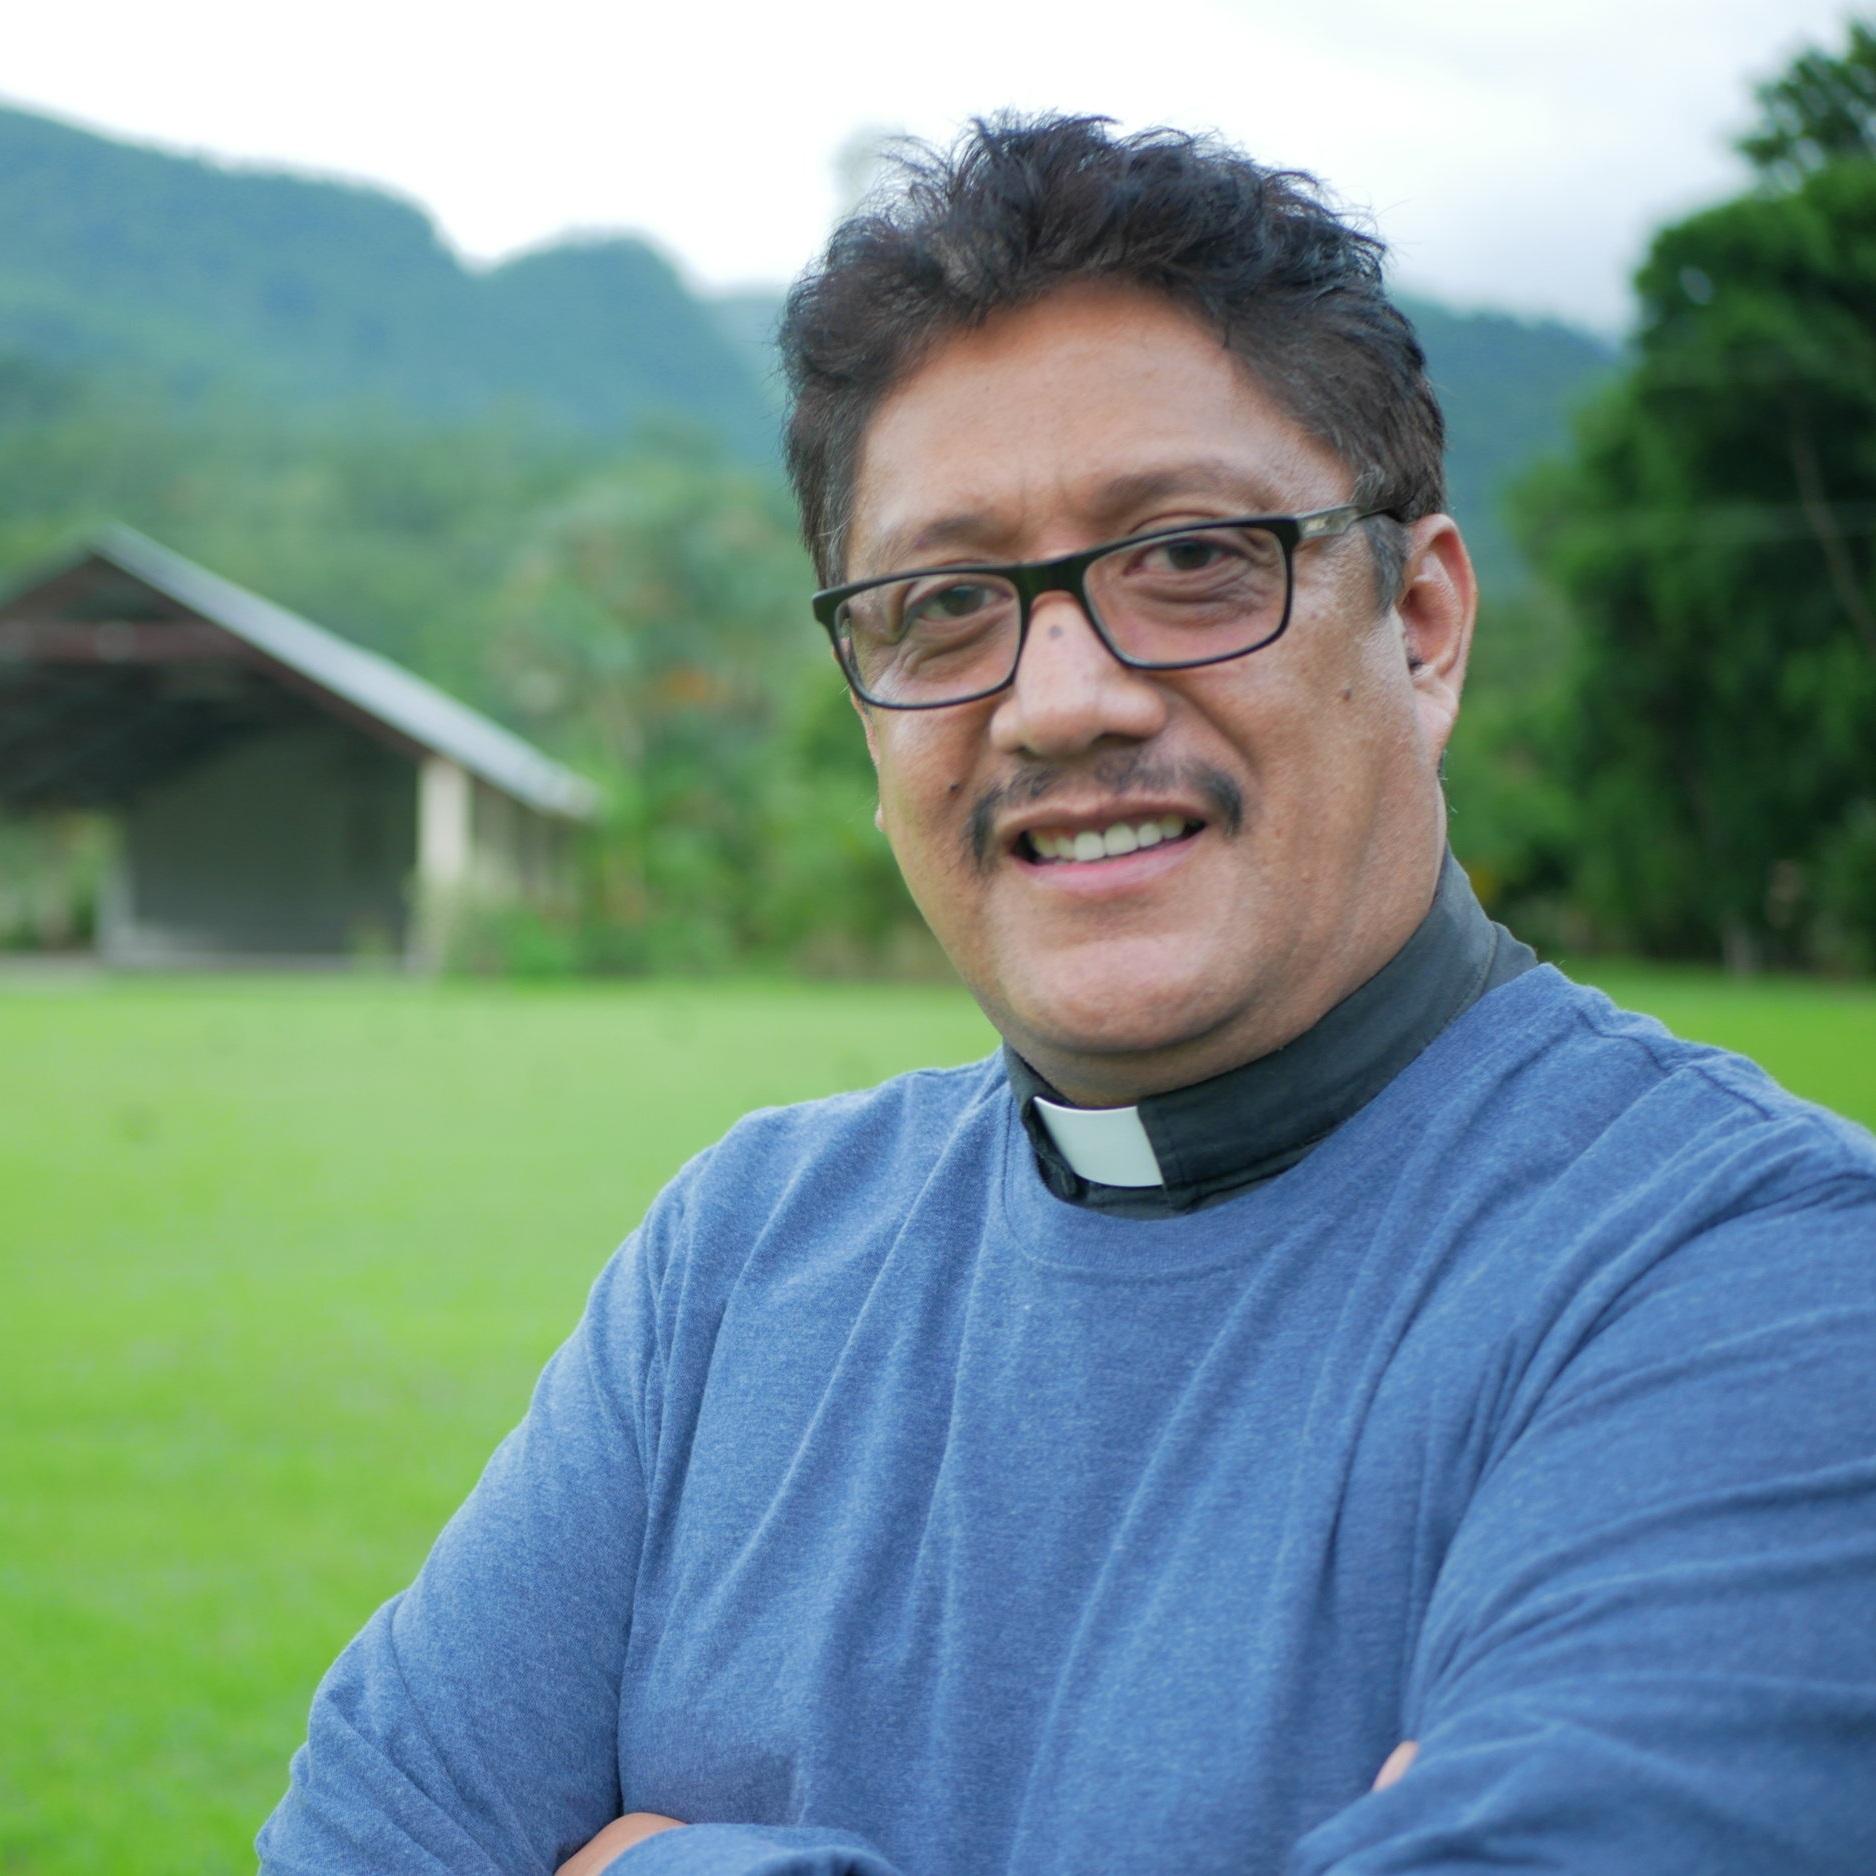 Mr. Gerardo Alonzo - Philosophy / Christianism 7th - 11th Gradegalonzo.smes@episcopalhn.org